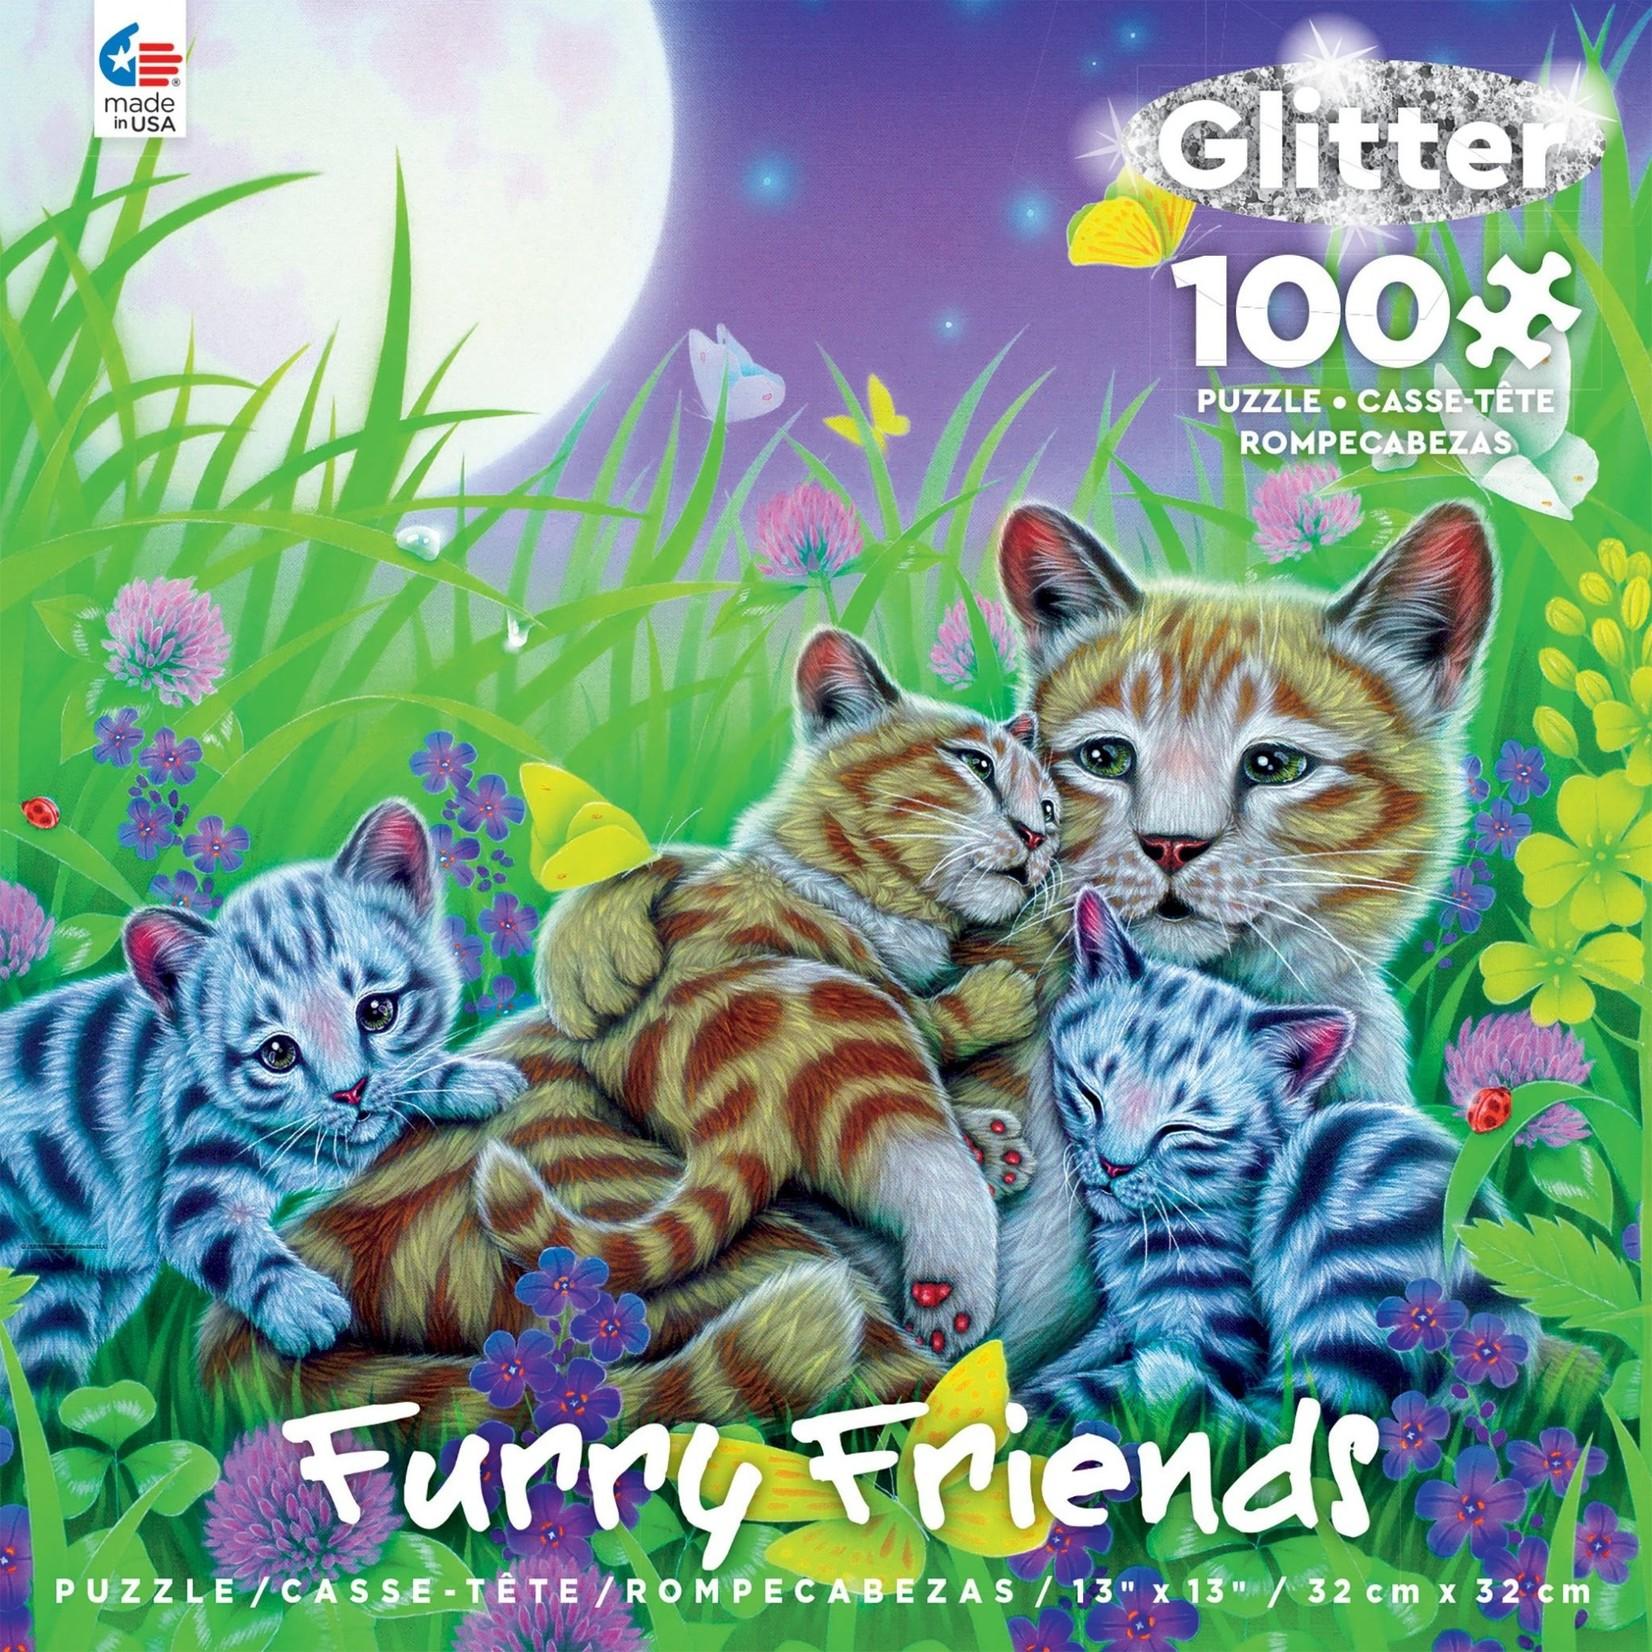 ceaco Ceaco - 100 Piece Puzzle: Glitter Furry Friends - Family Cat